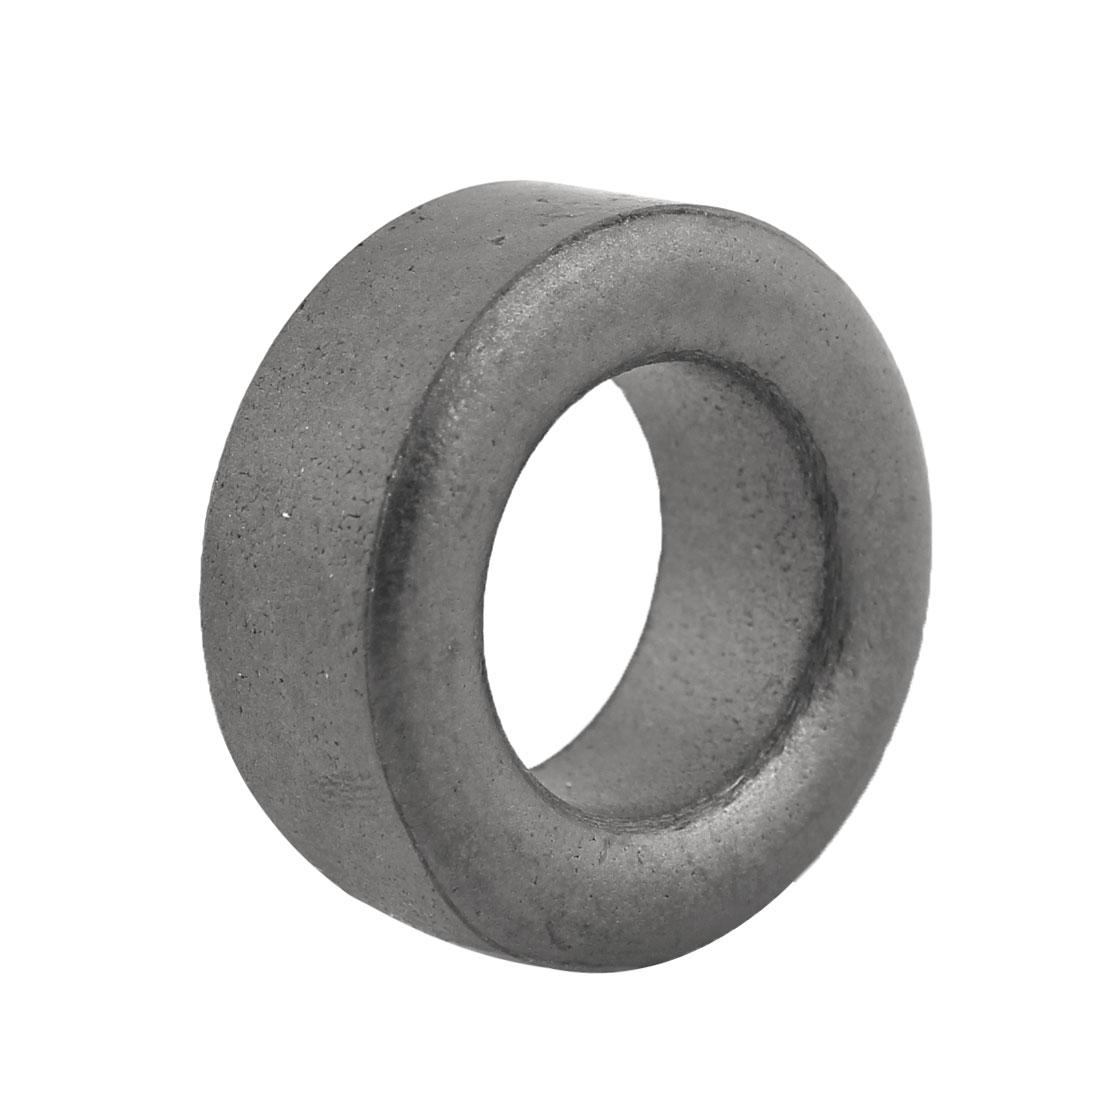 Metal Core Power Inductor Ferrite Rings Toroid Cord 25x10x15mm